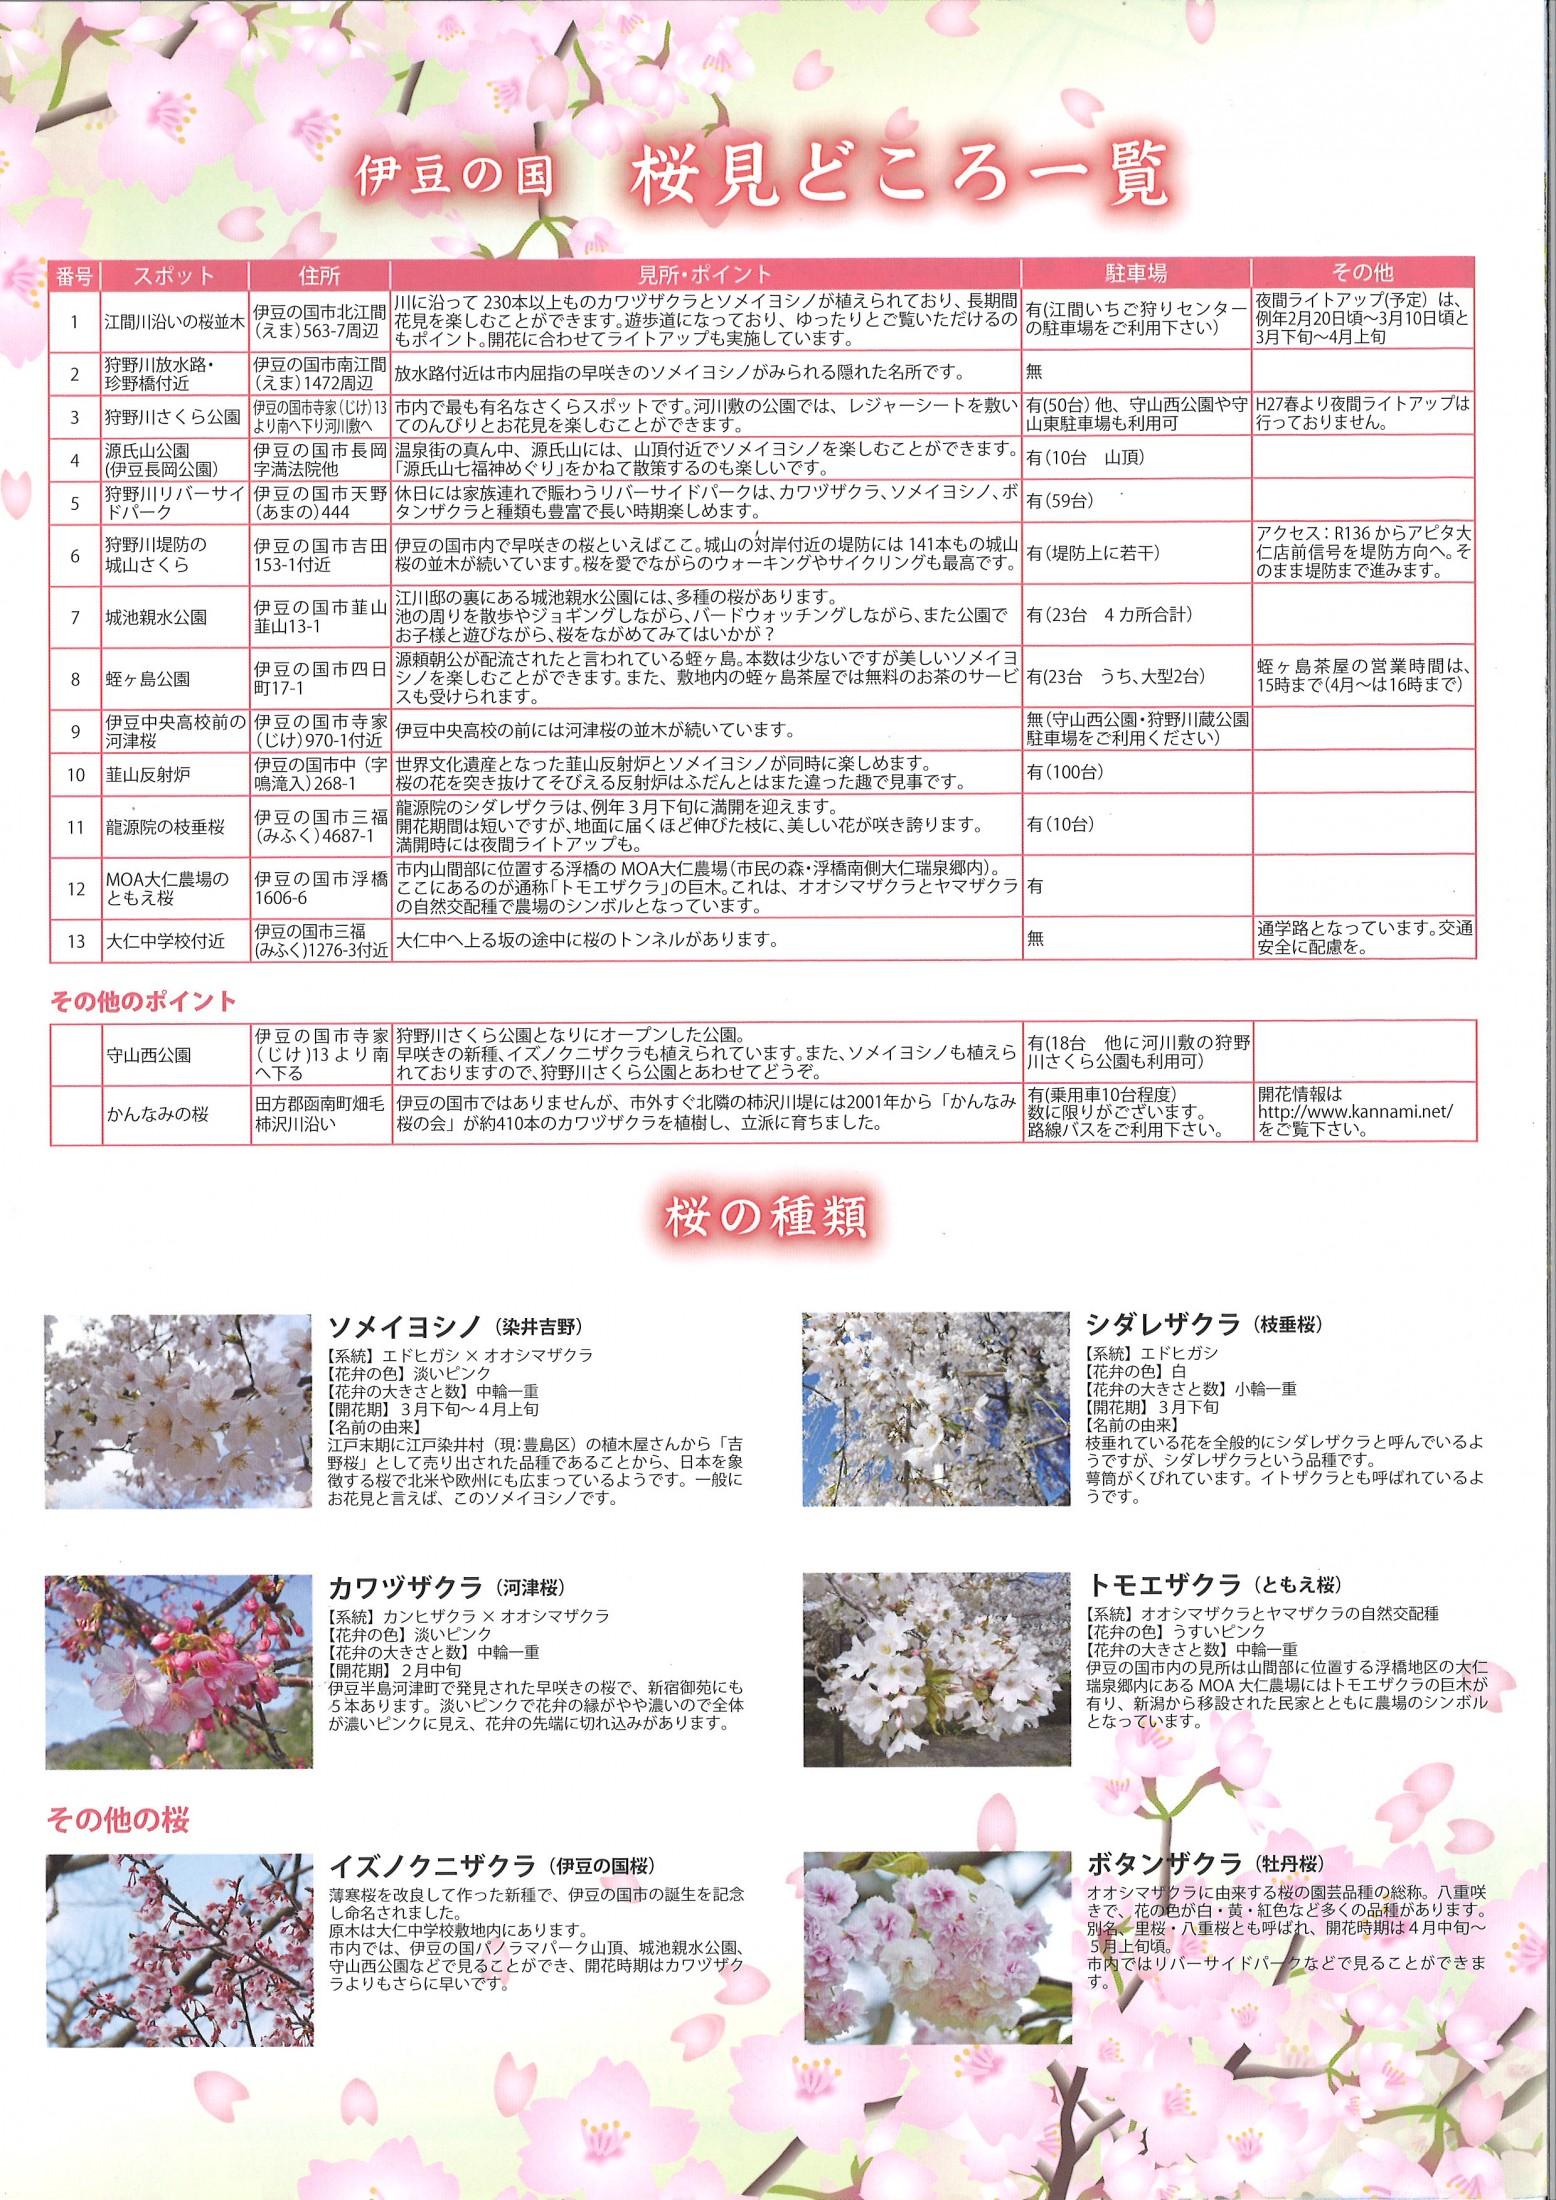 sakuramap-midokoro-e1456452515951